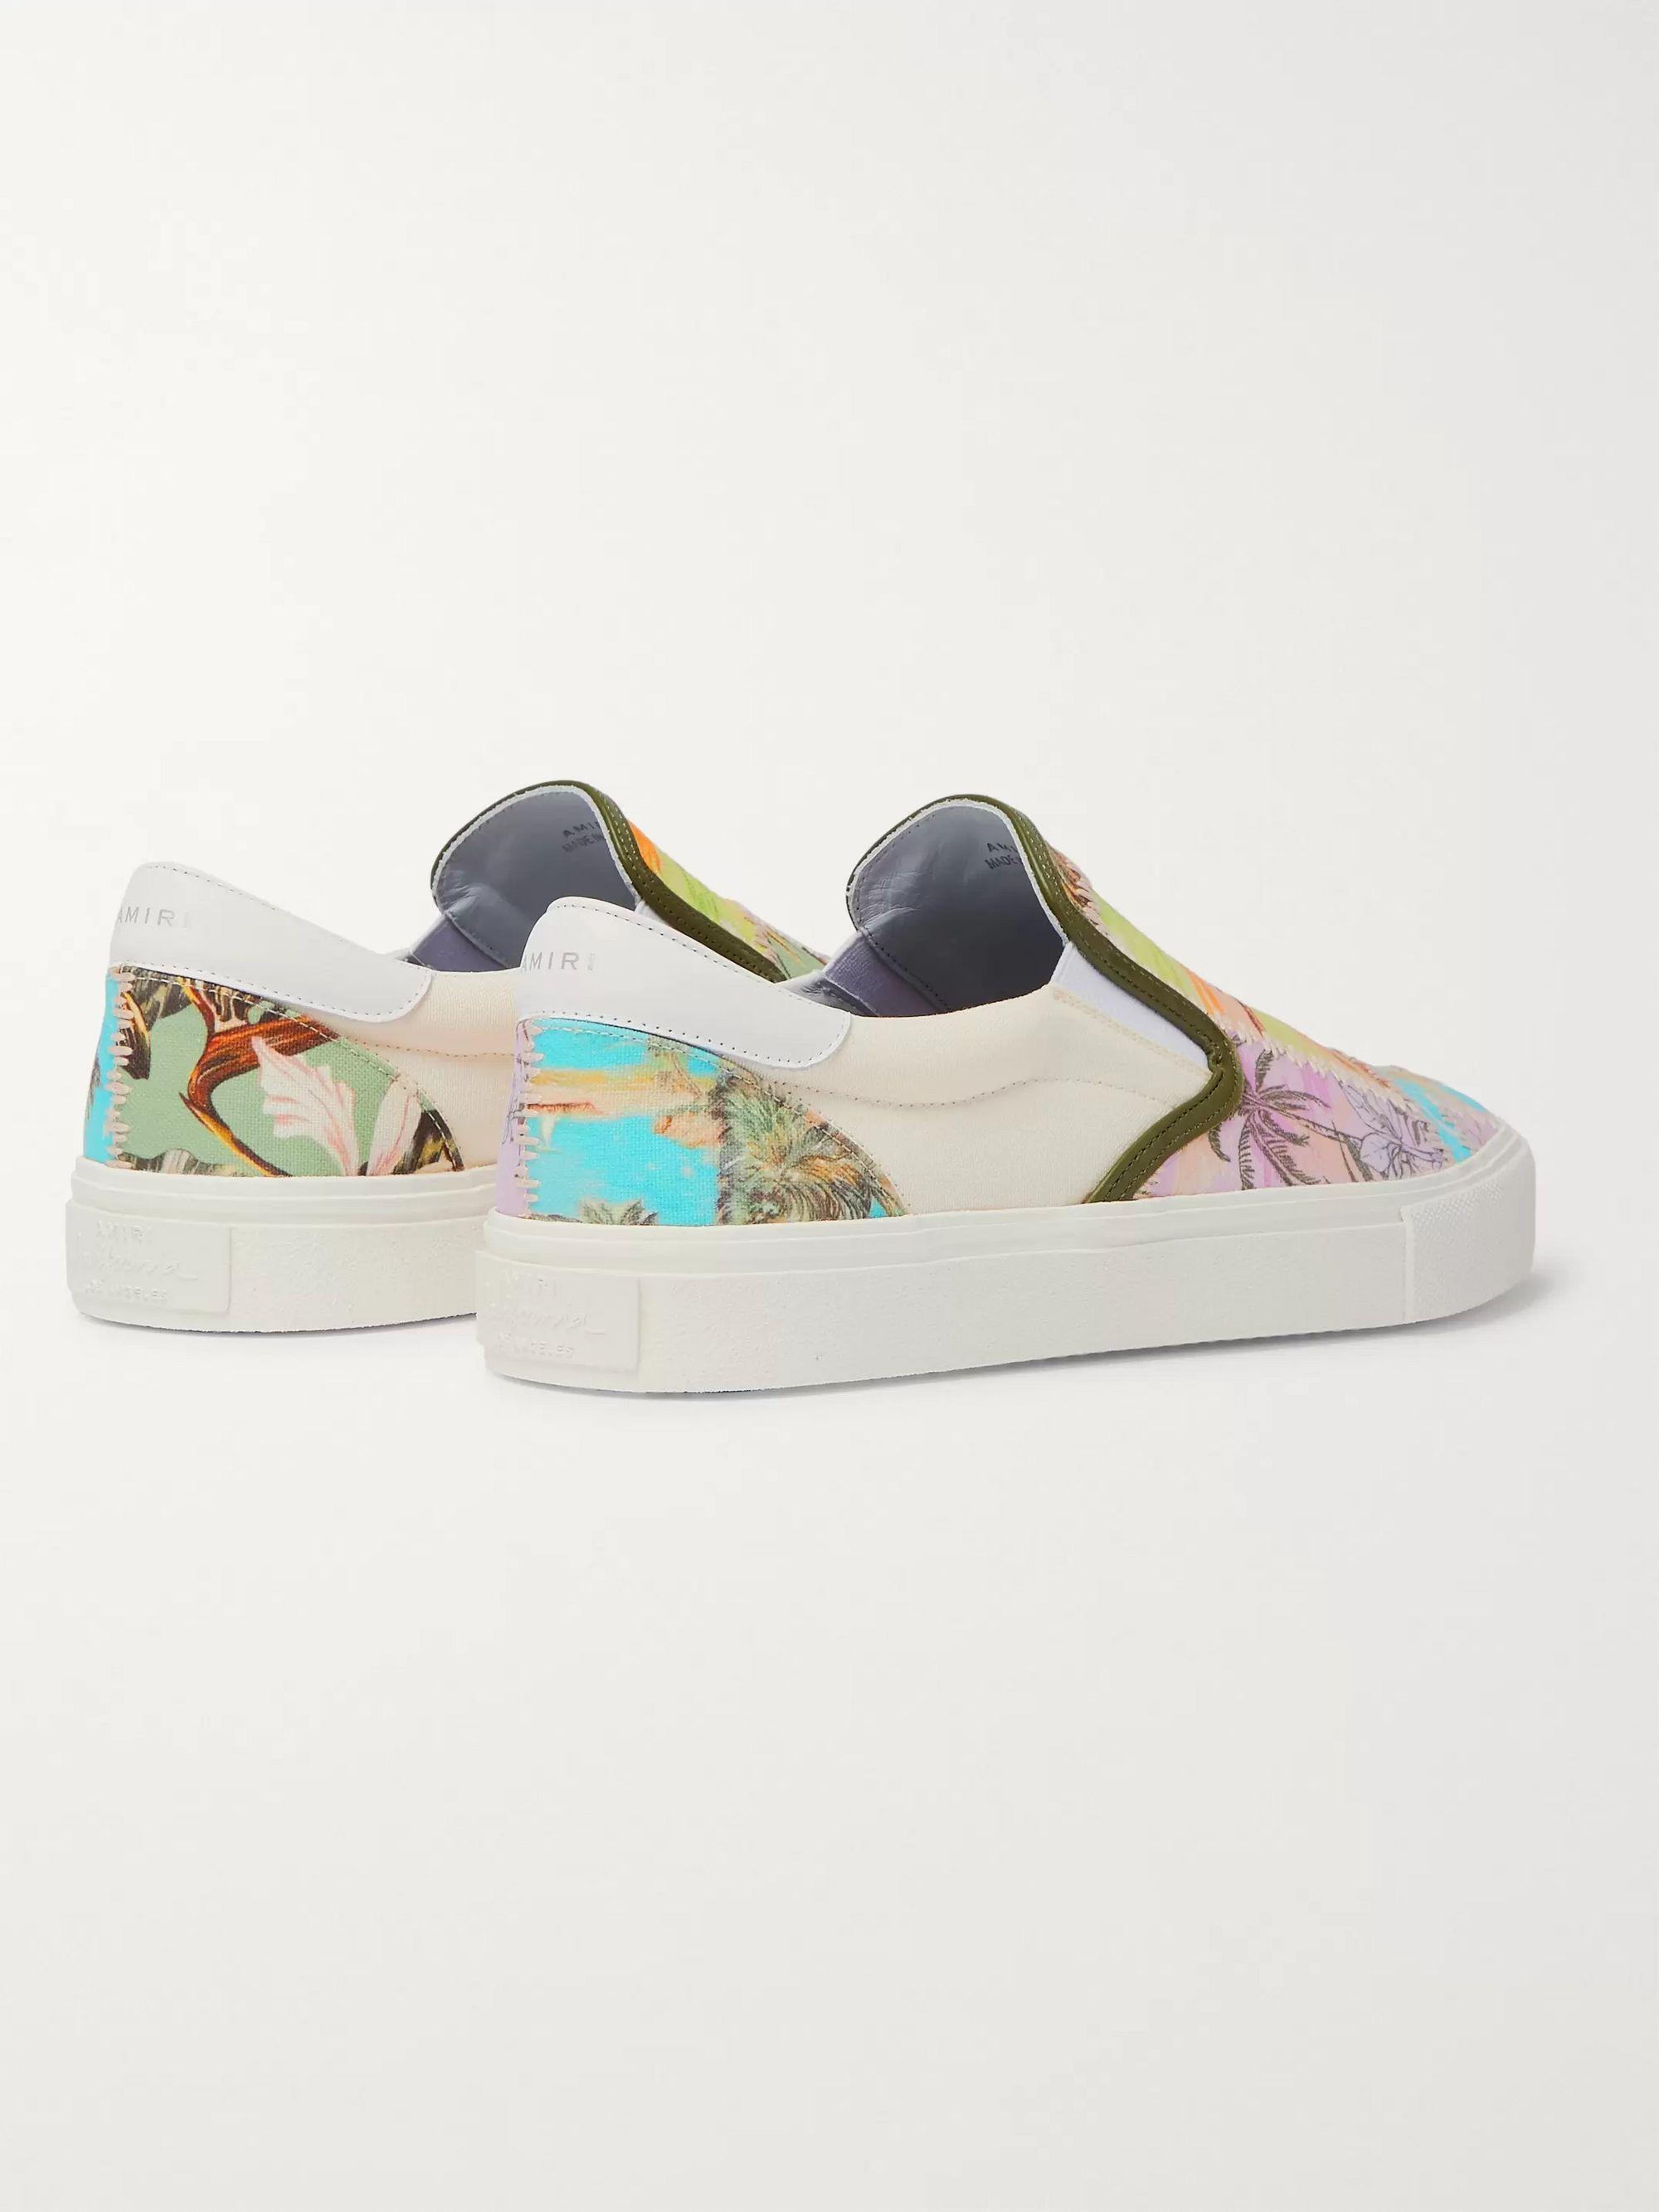 Purple Leather-trimmed Printed Canvas Slip-on Sneakers | Amiri